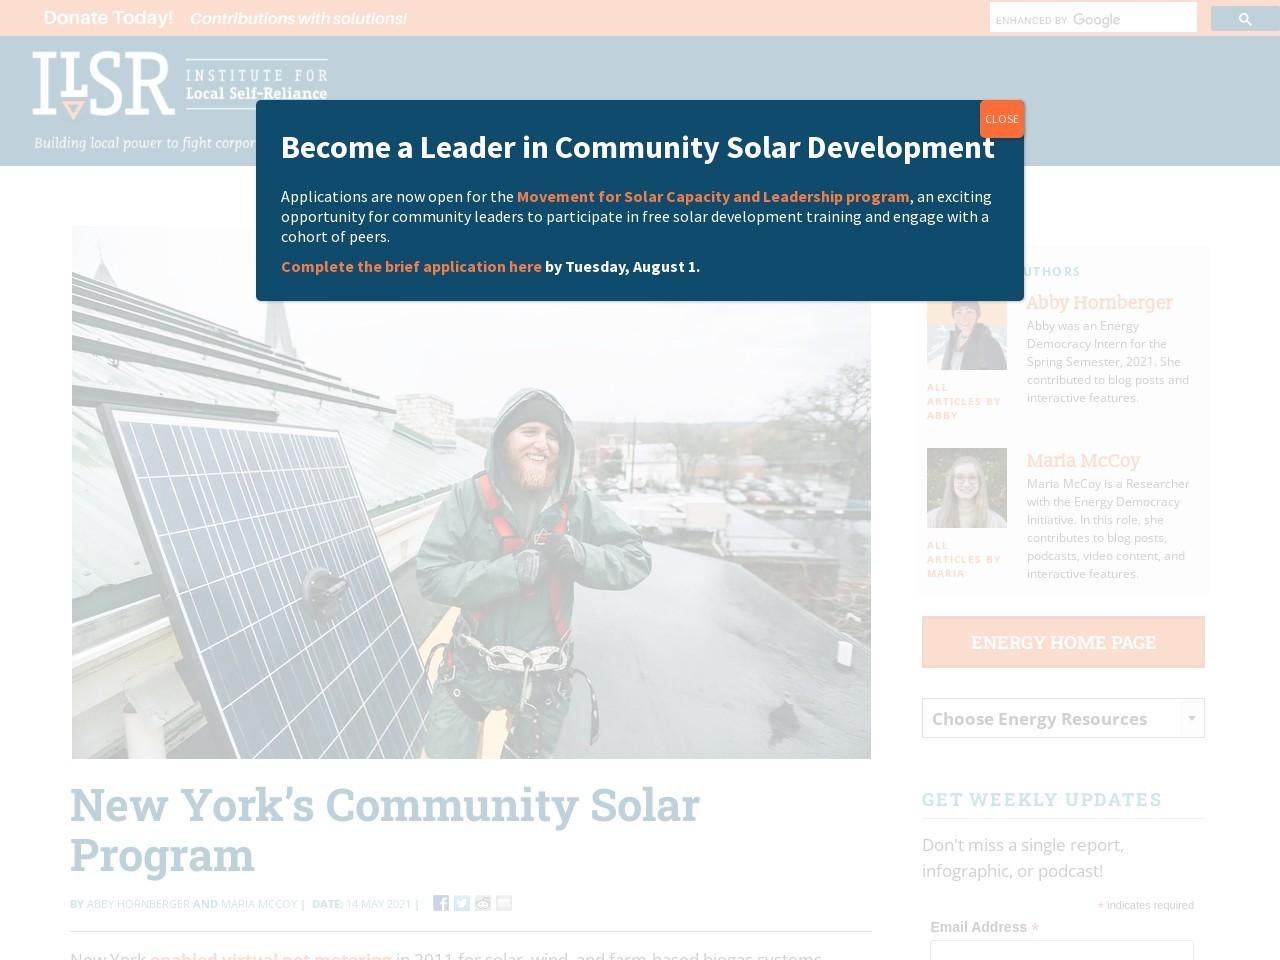 New York's Community Solar Program